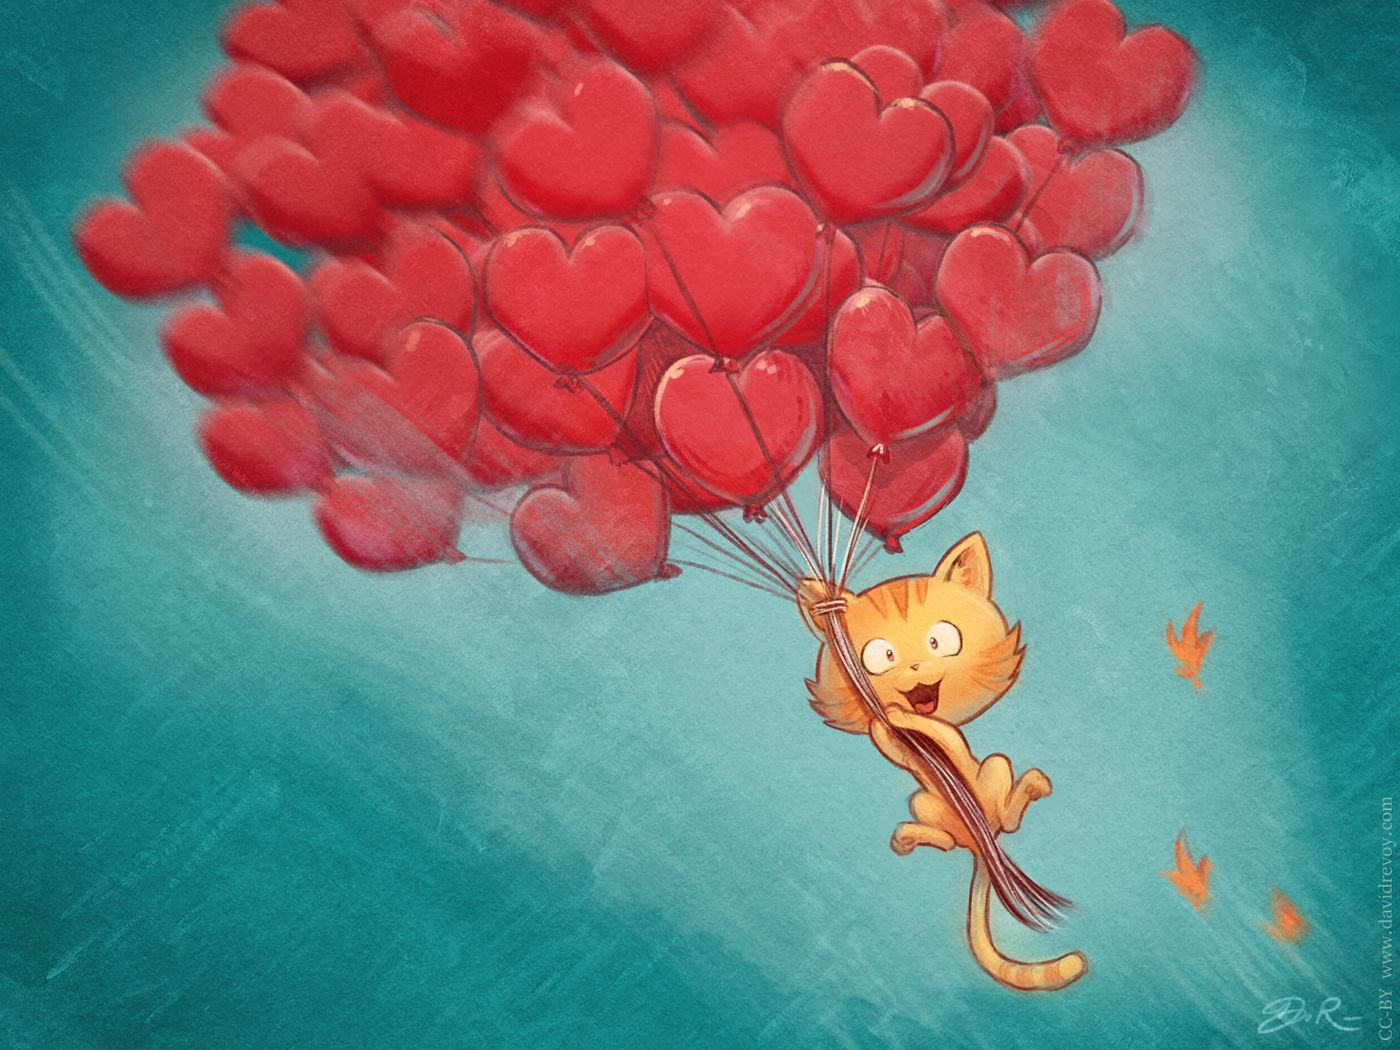 1400x1050 Wallpaper cat, balloons, hearts, flight, sky, art